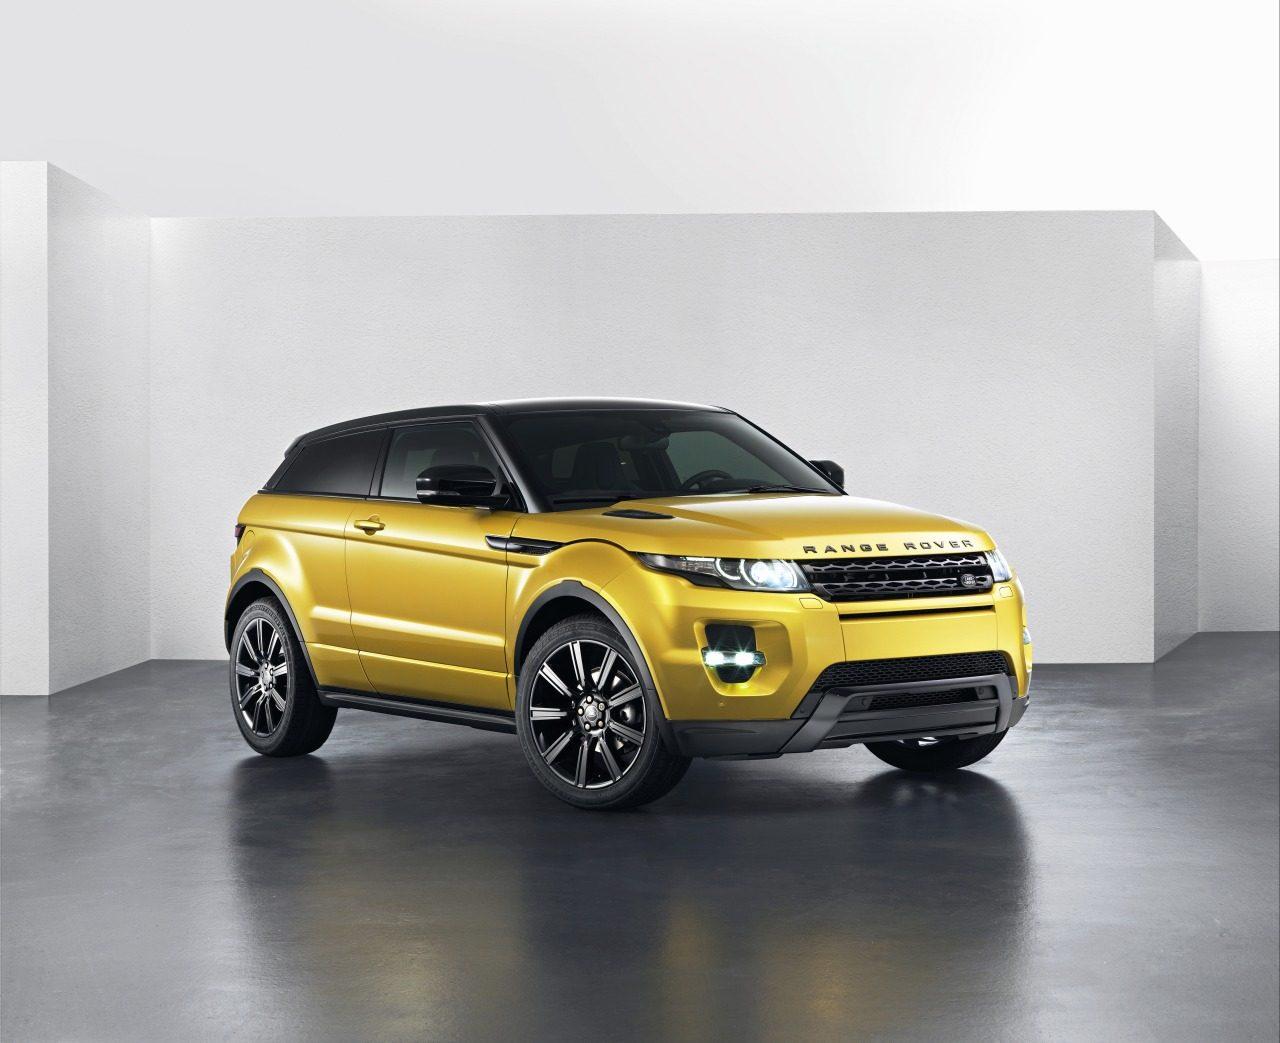 Range-Rover-Evoque-Sicilian-Yellow-01.jpg